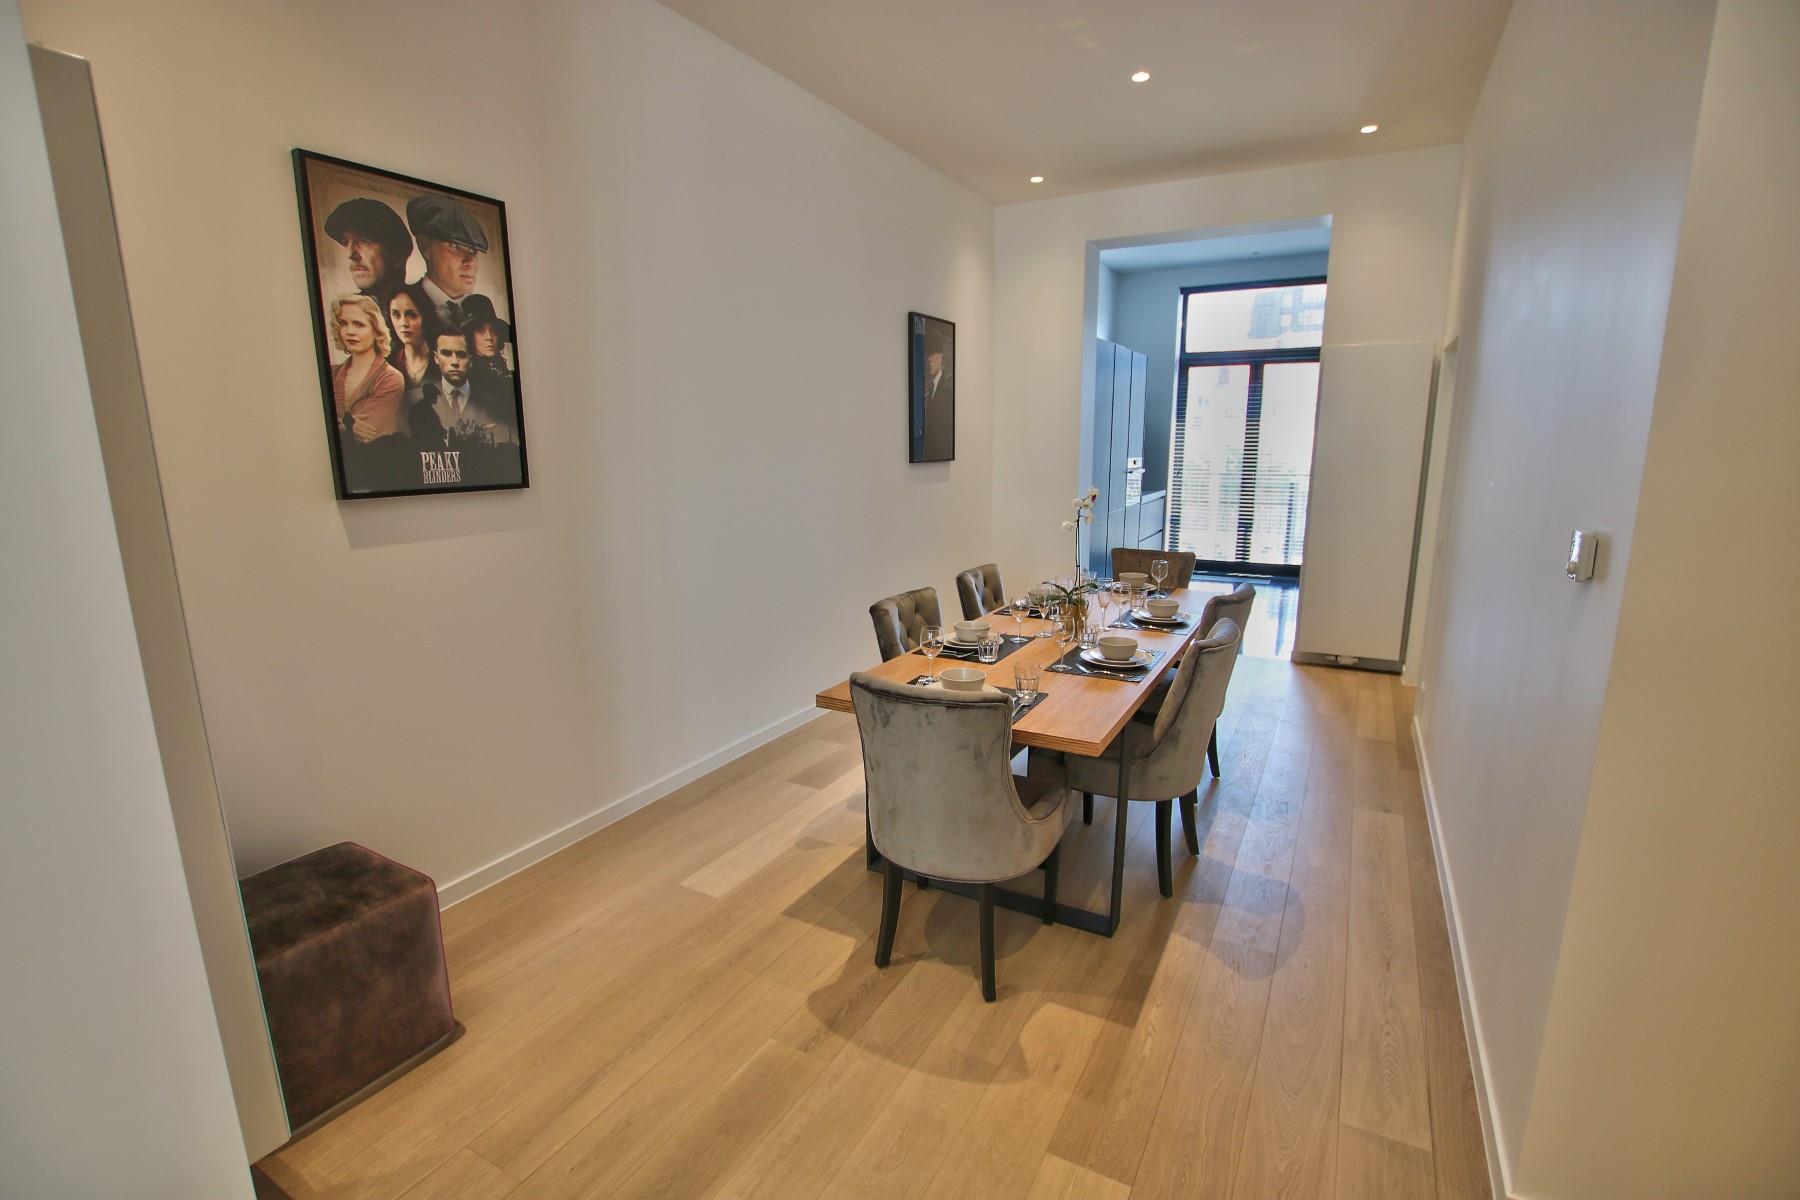 Appartement exceptionnel - Etterbeek - #4255737-2